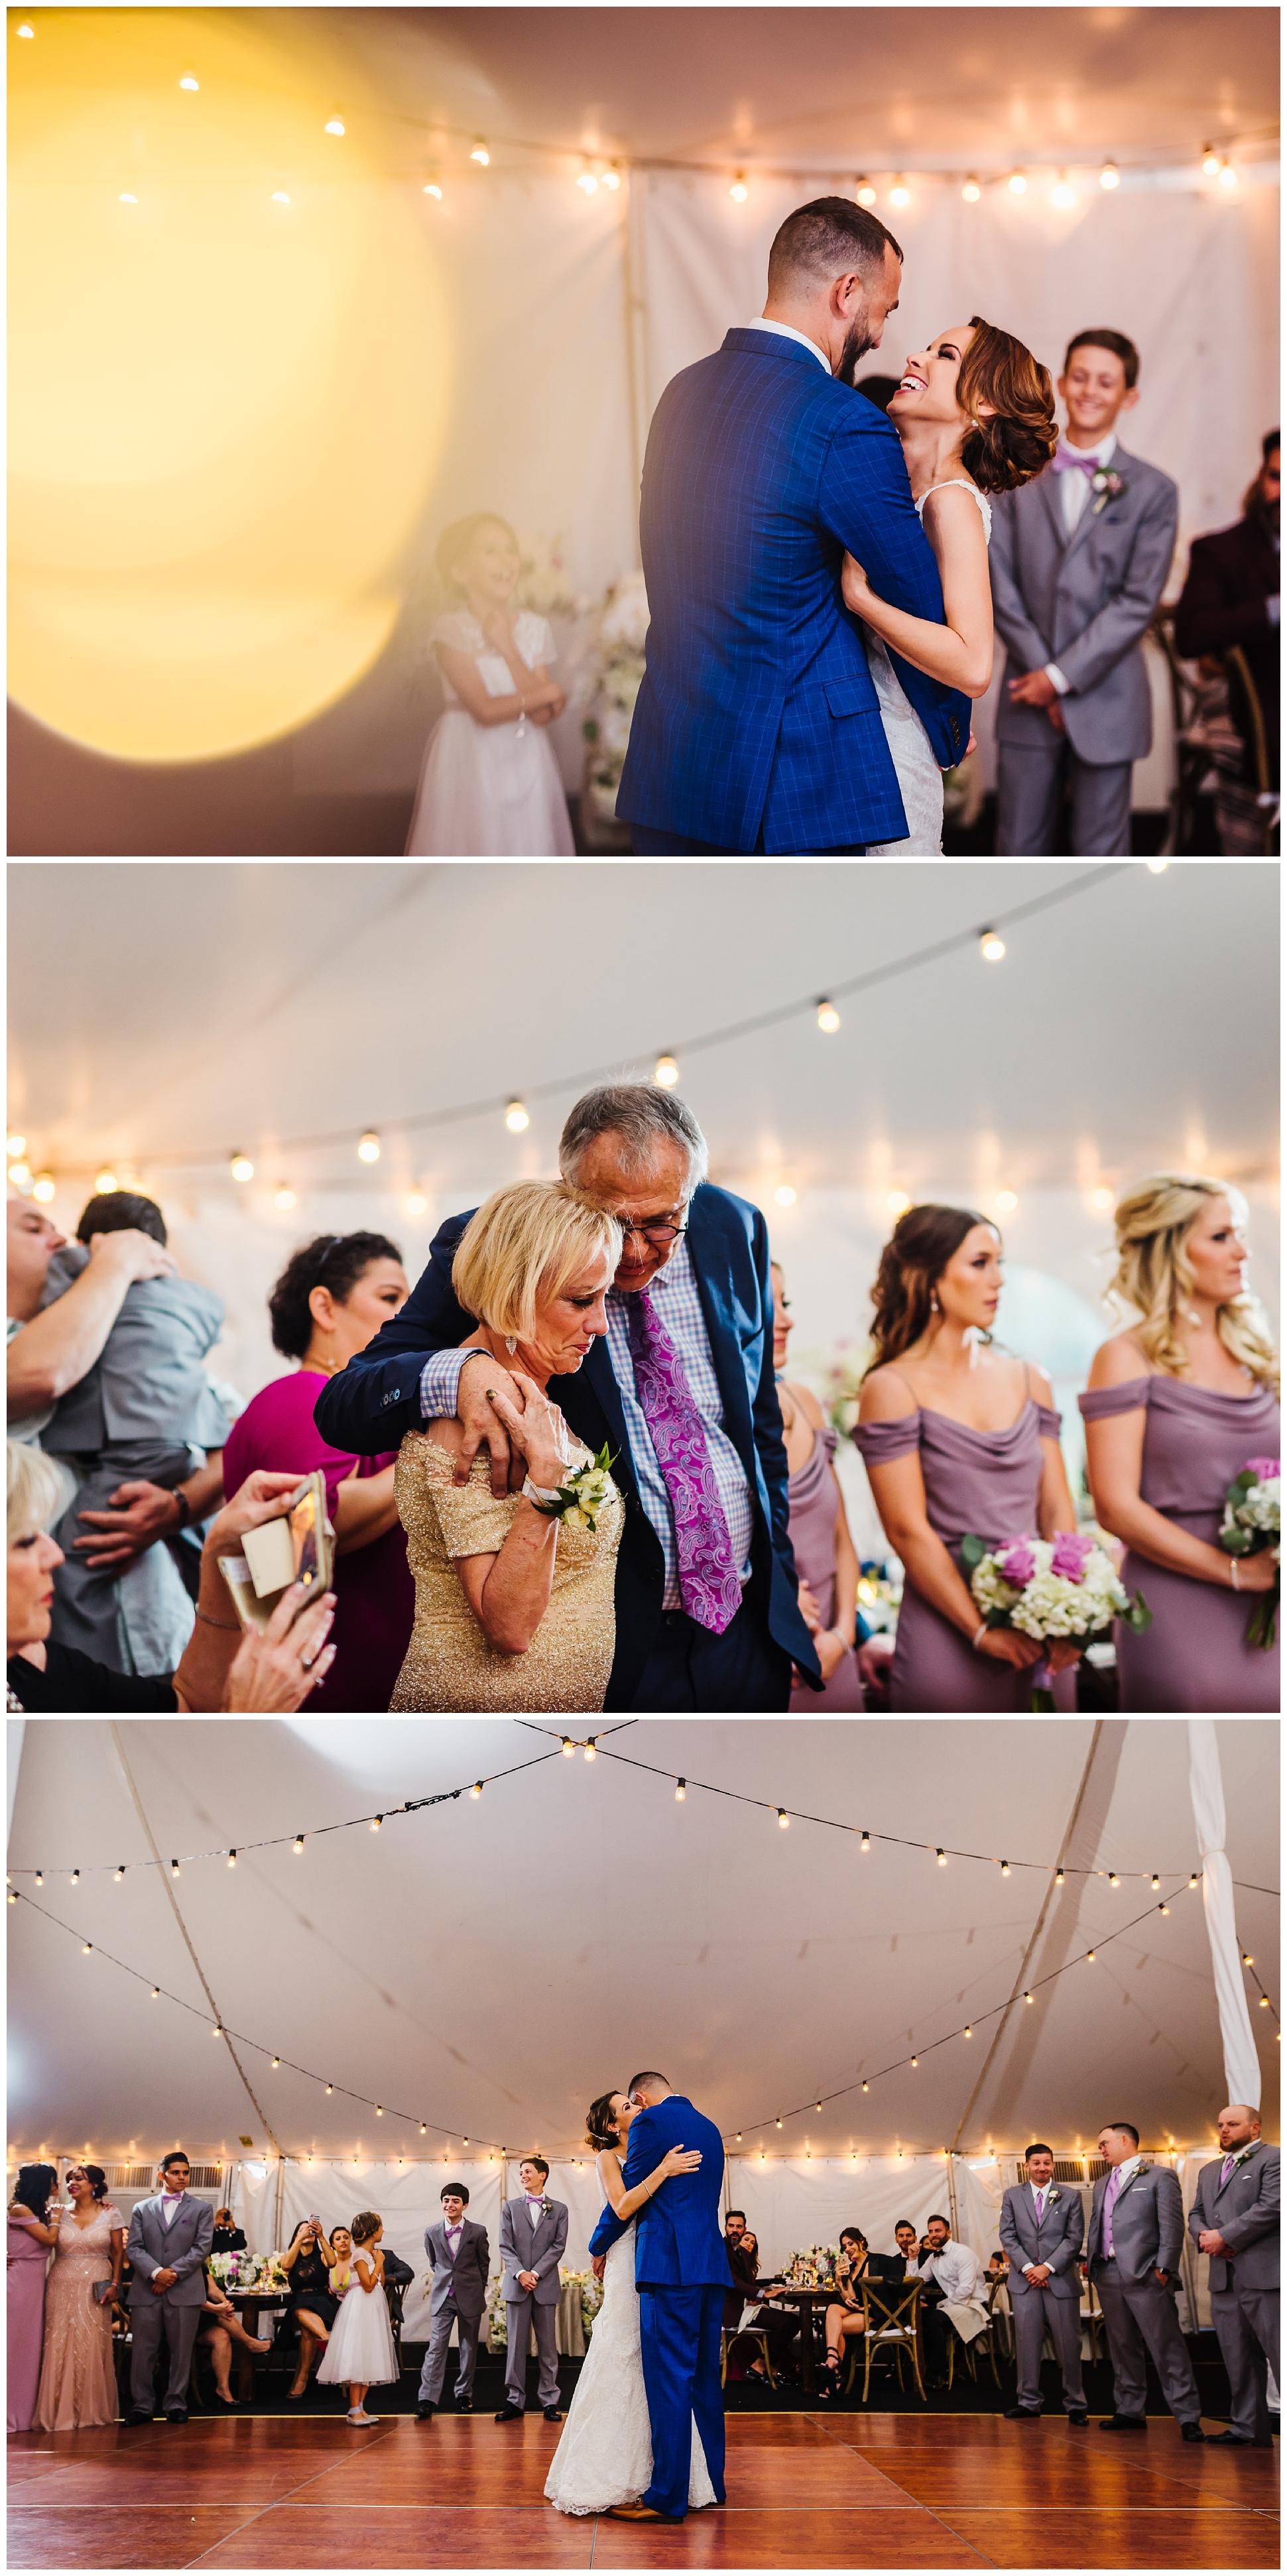 Tampa-luxury-wedding-photographer-mision-lago-private-estate_0053.jpg